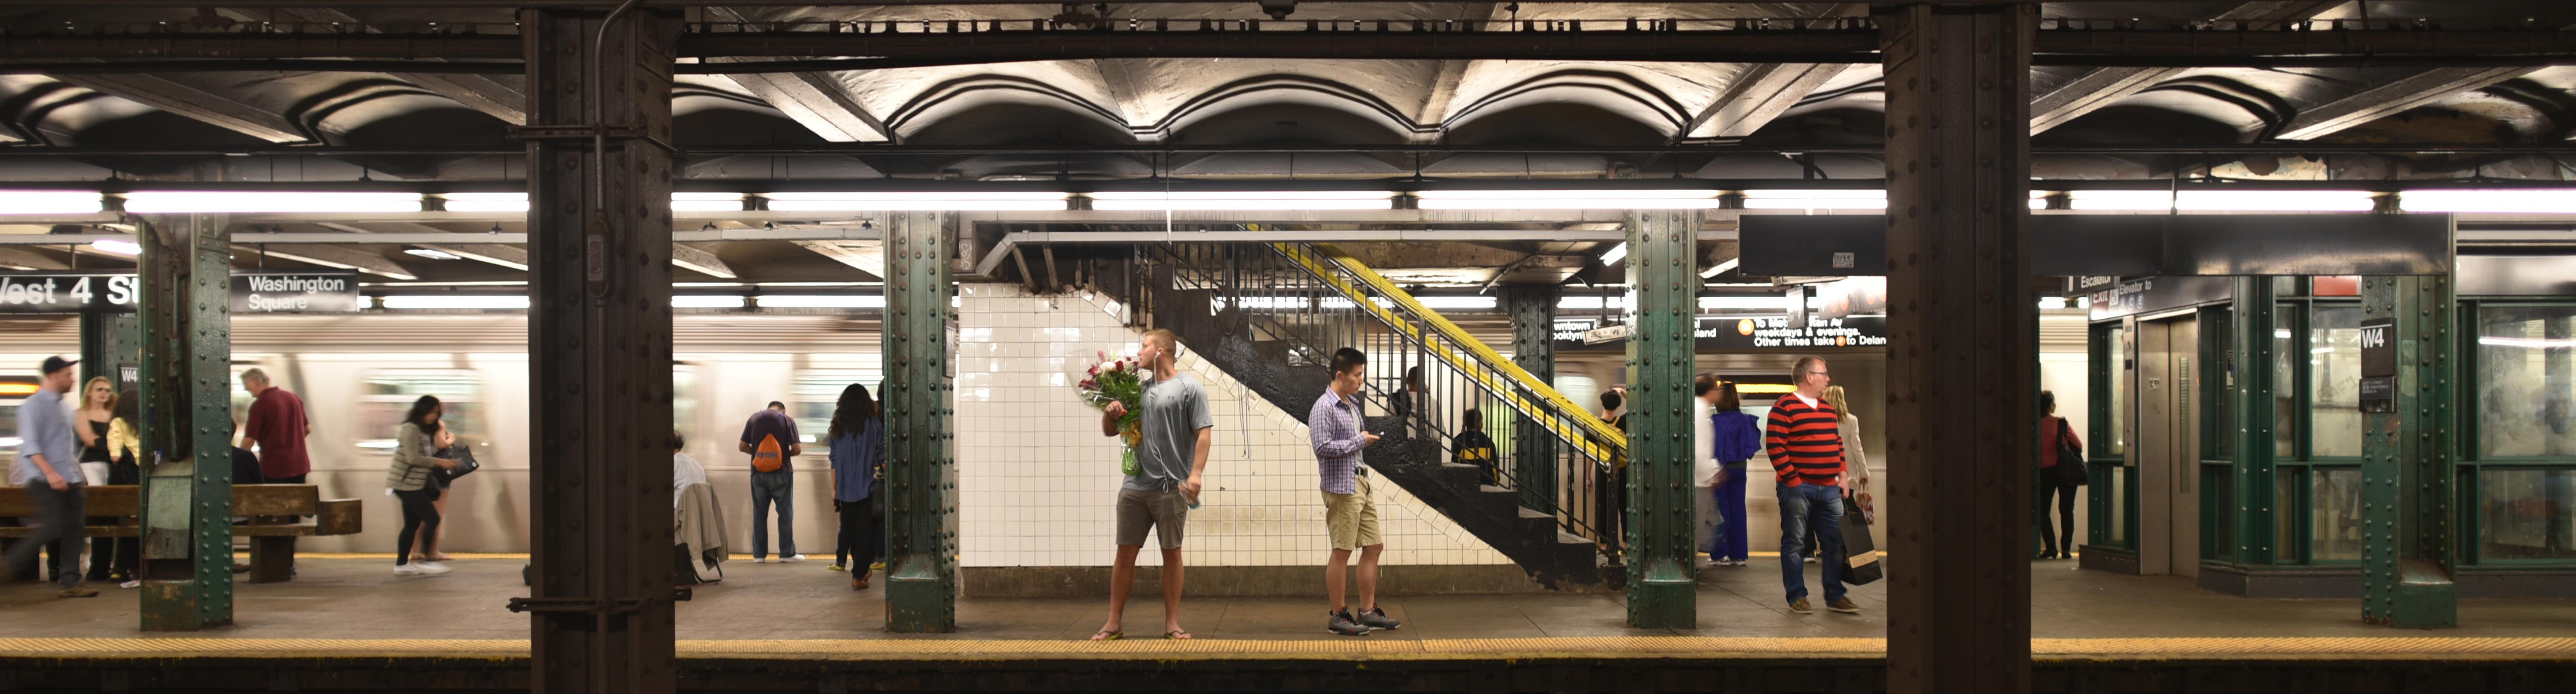 farge_subway II 36x9